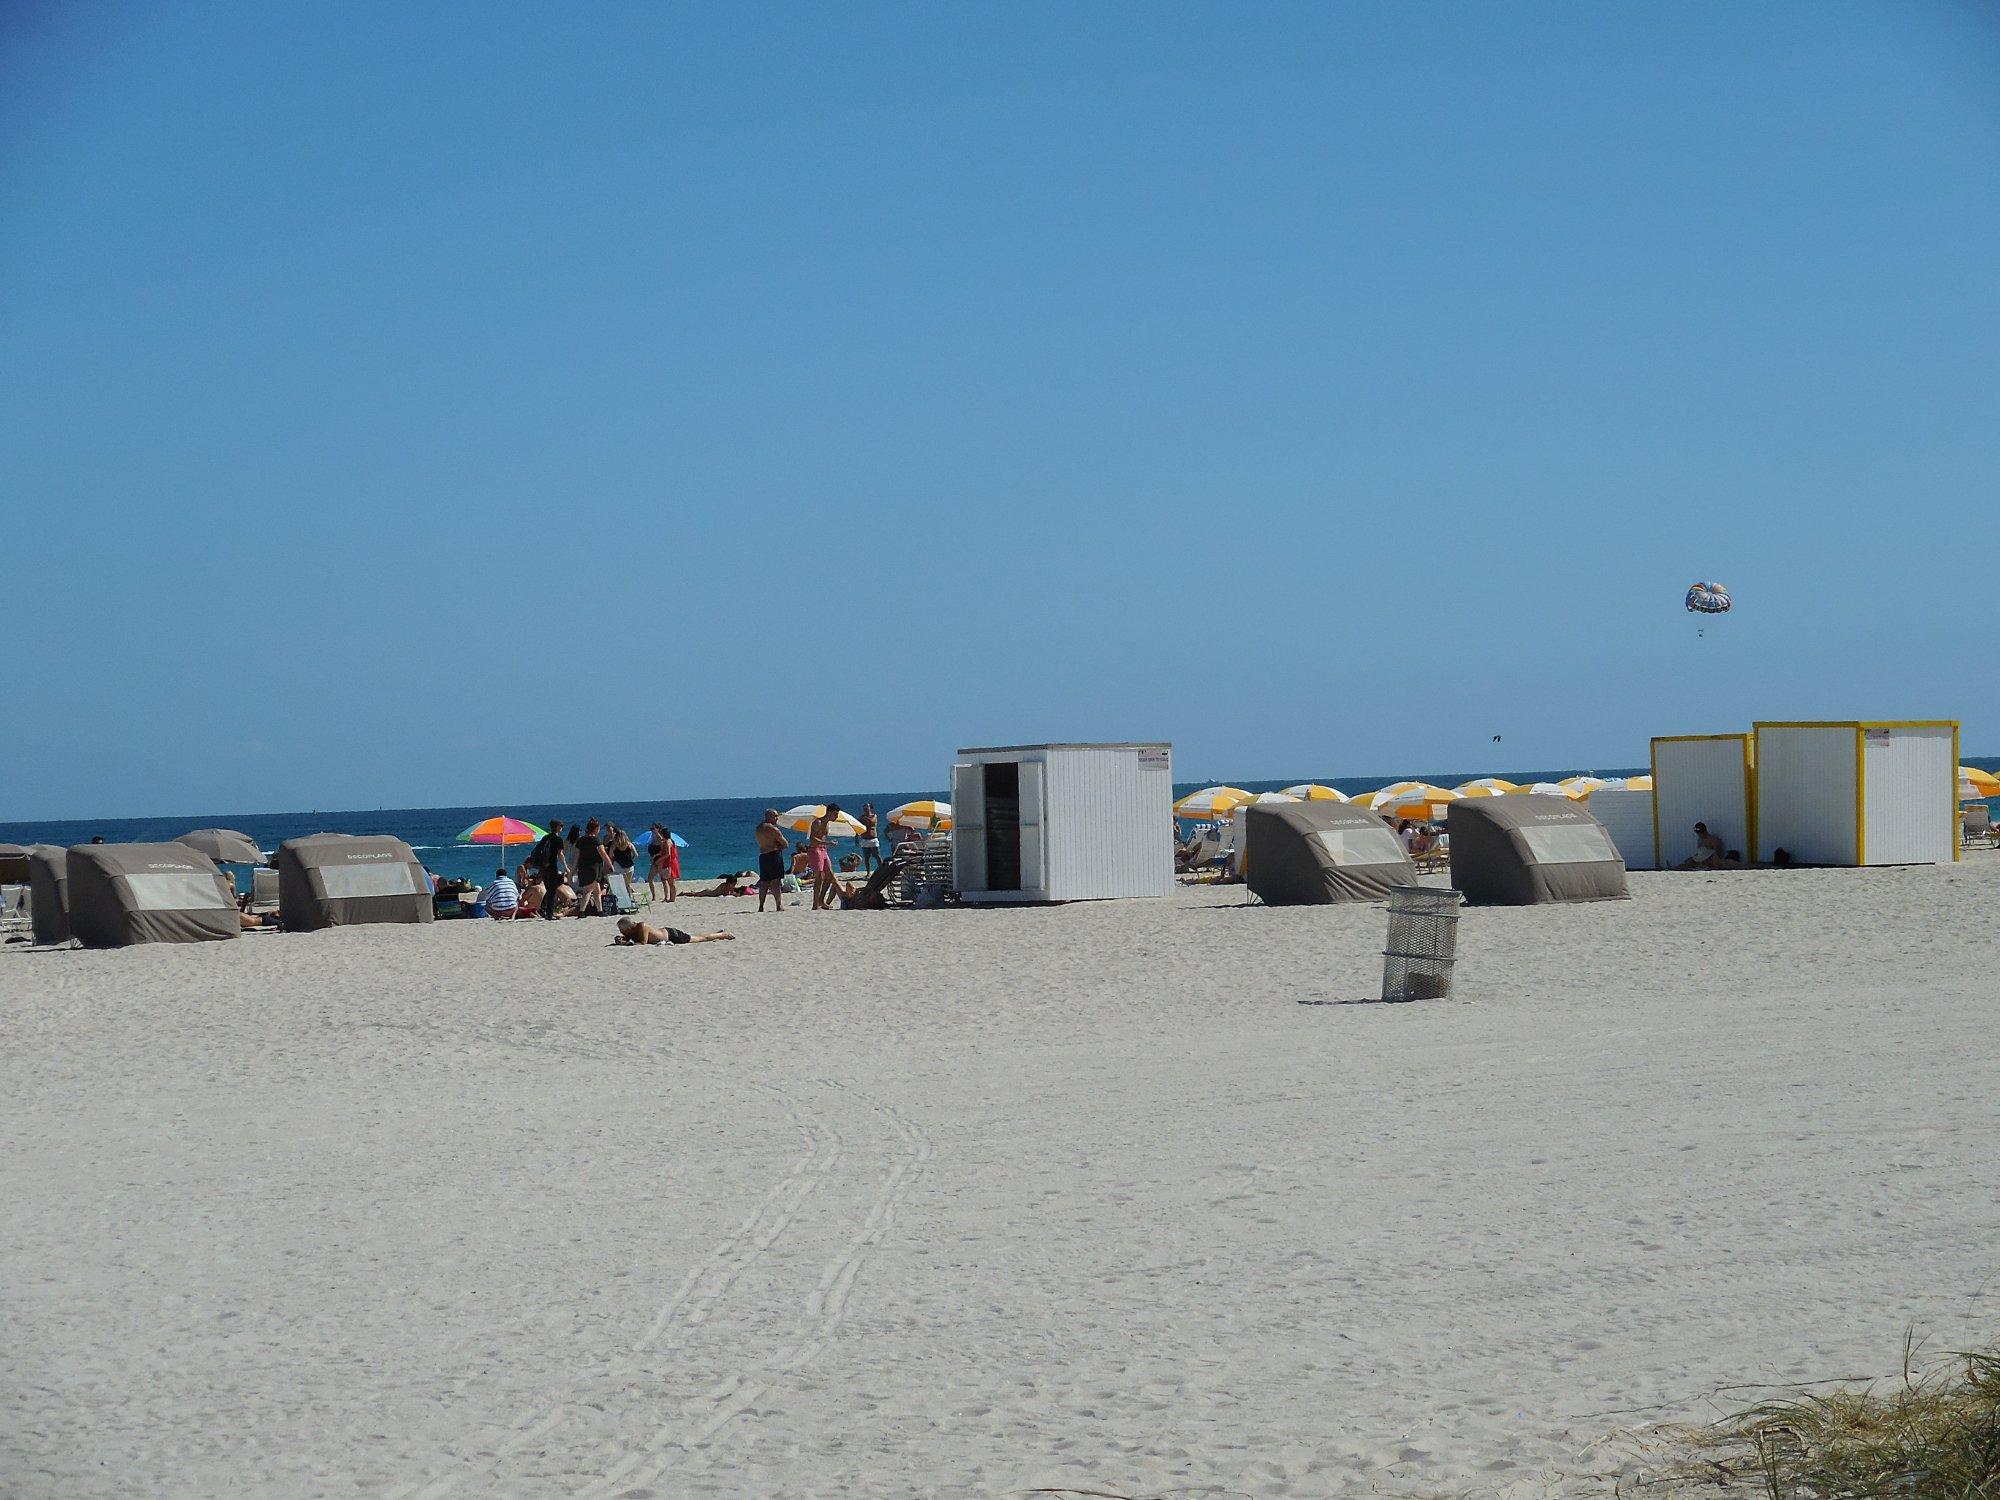 Miami Beach (FL), USA